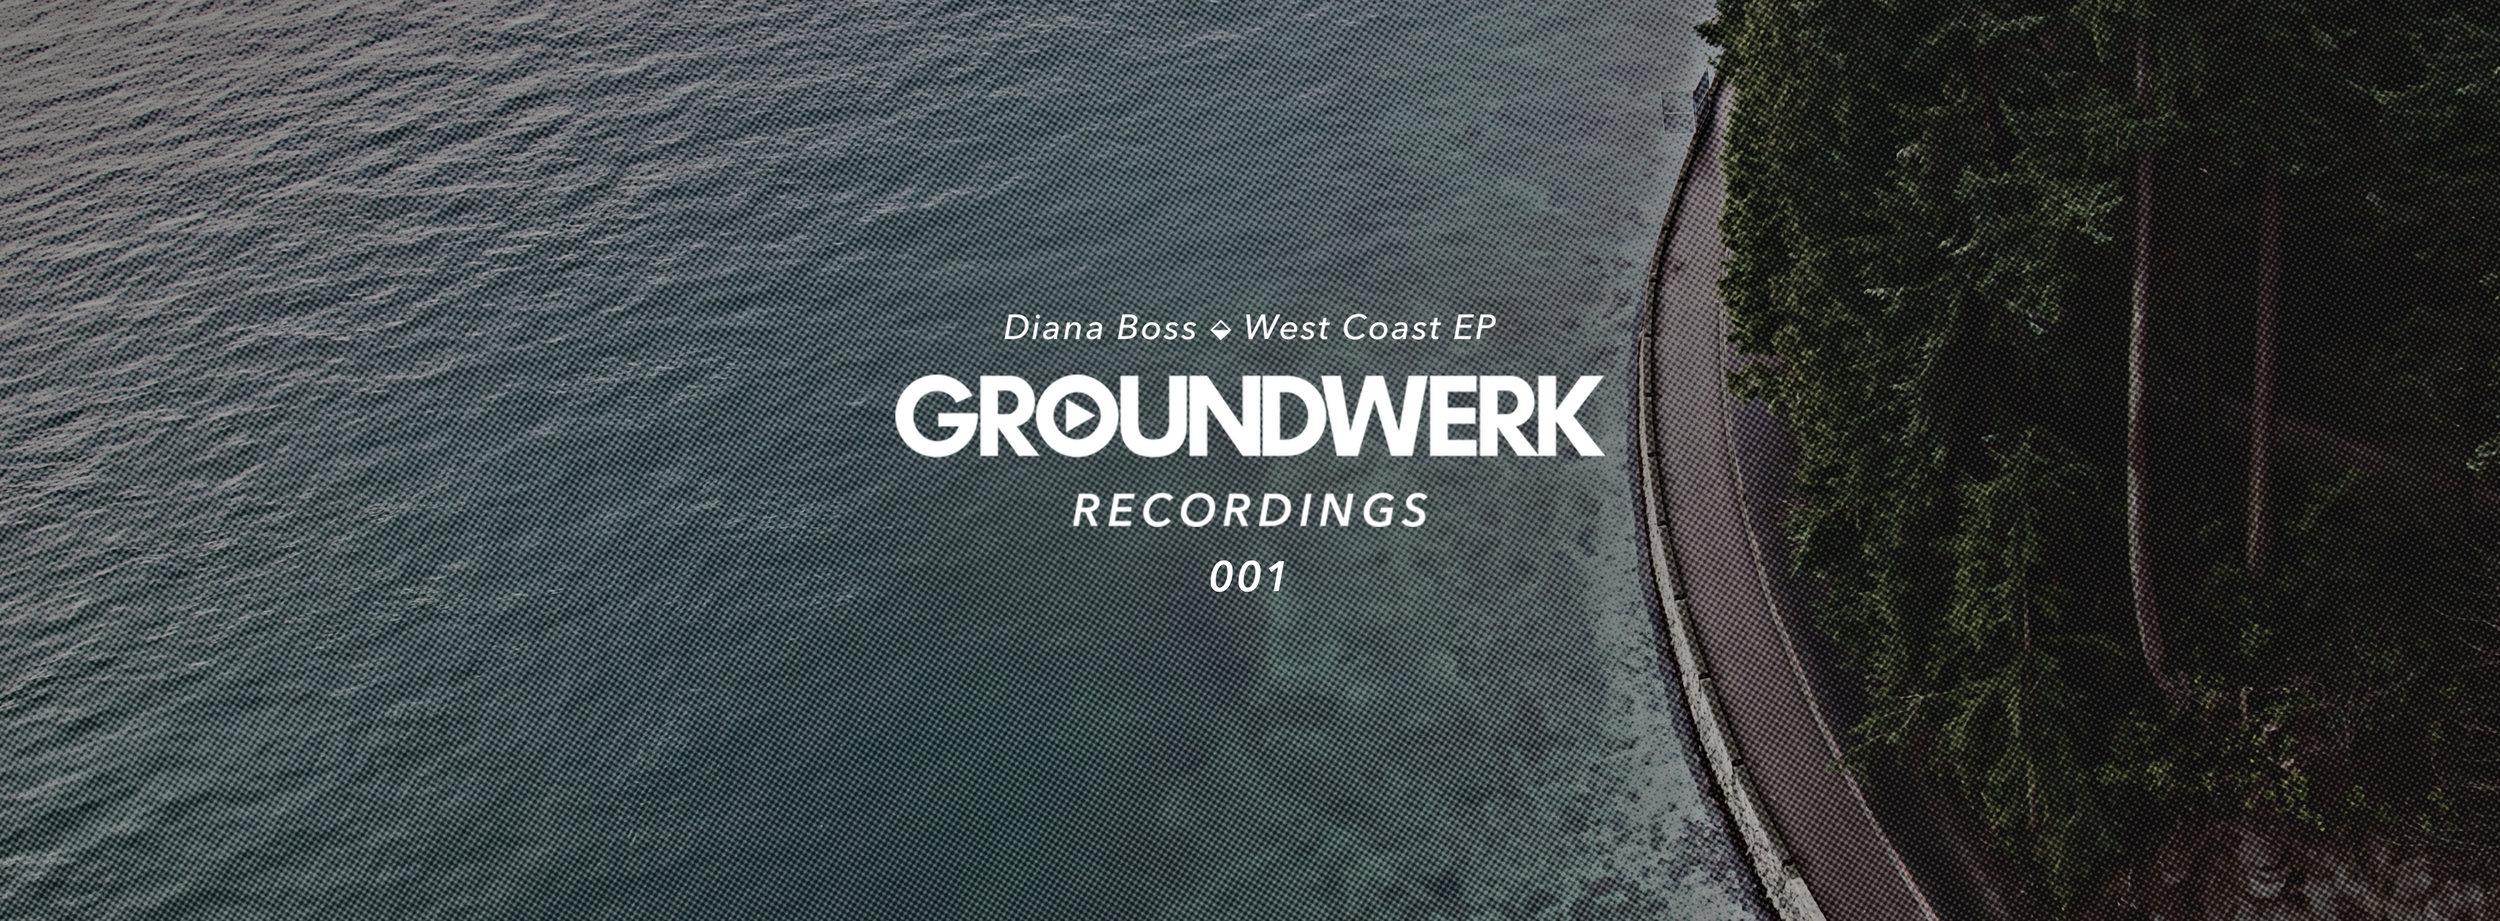 Groundwerk Recordings Diana Boss Release